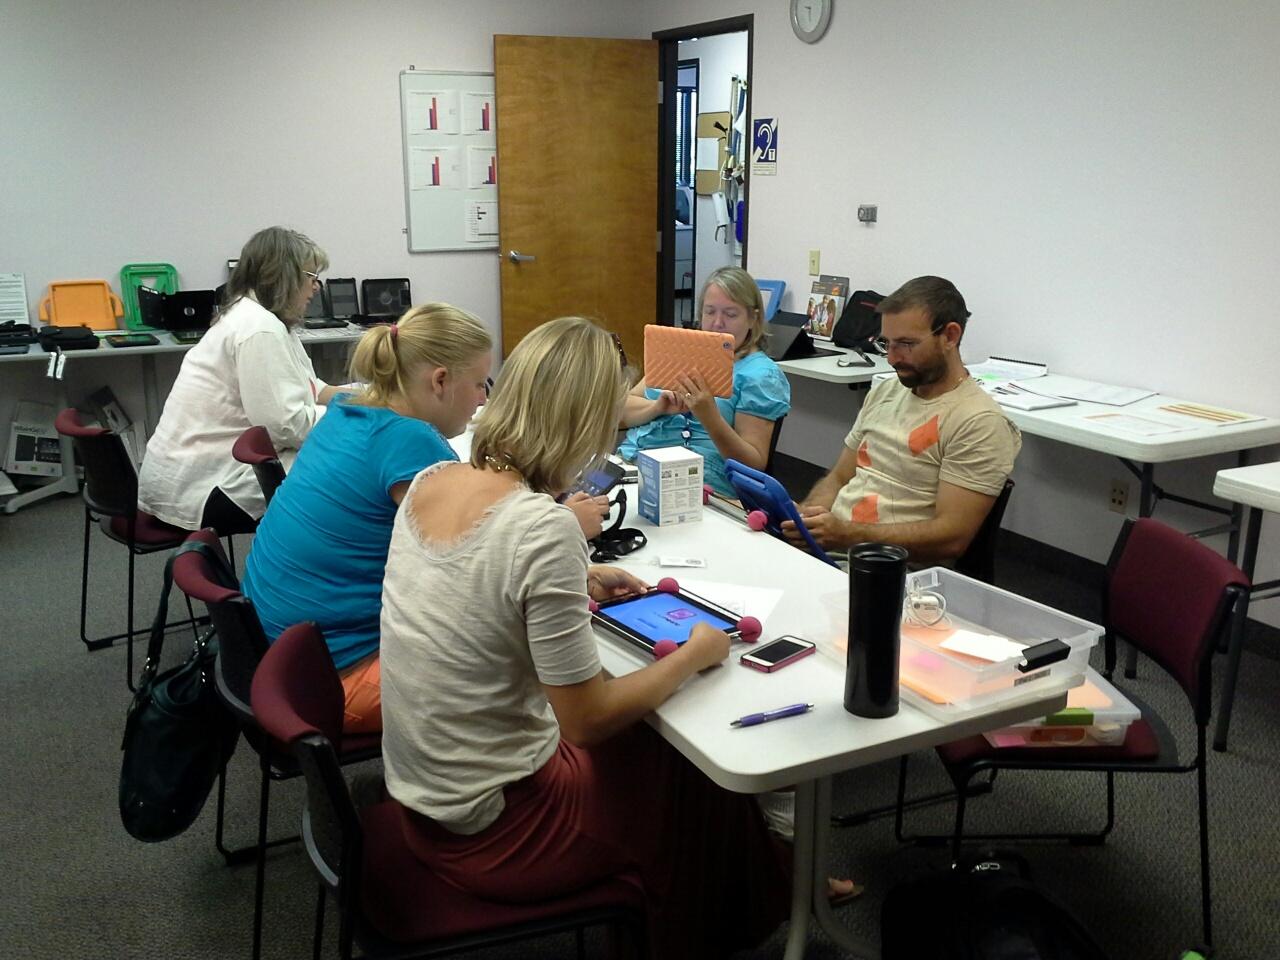 iPAD Training in the AzTAP Training Room